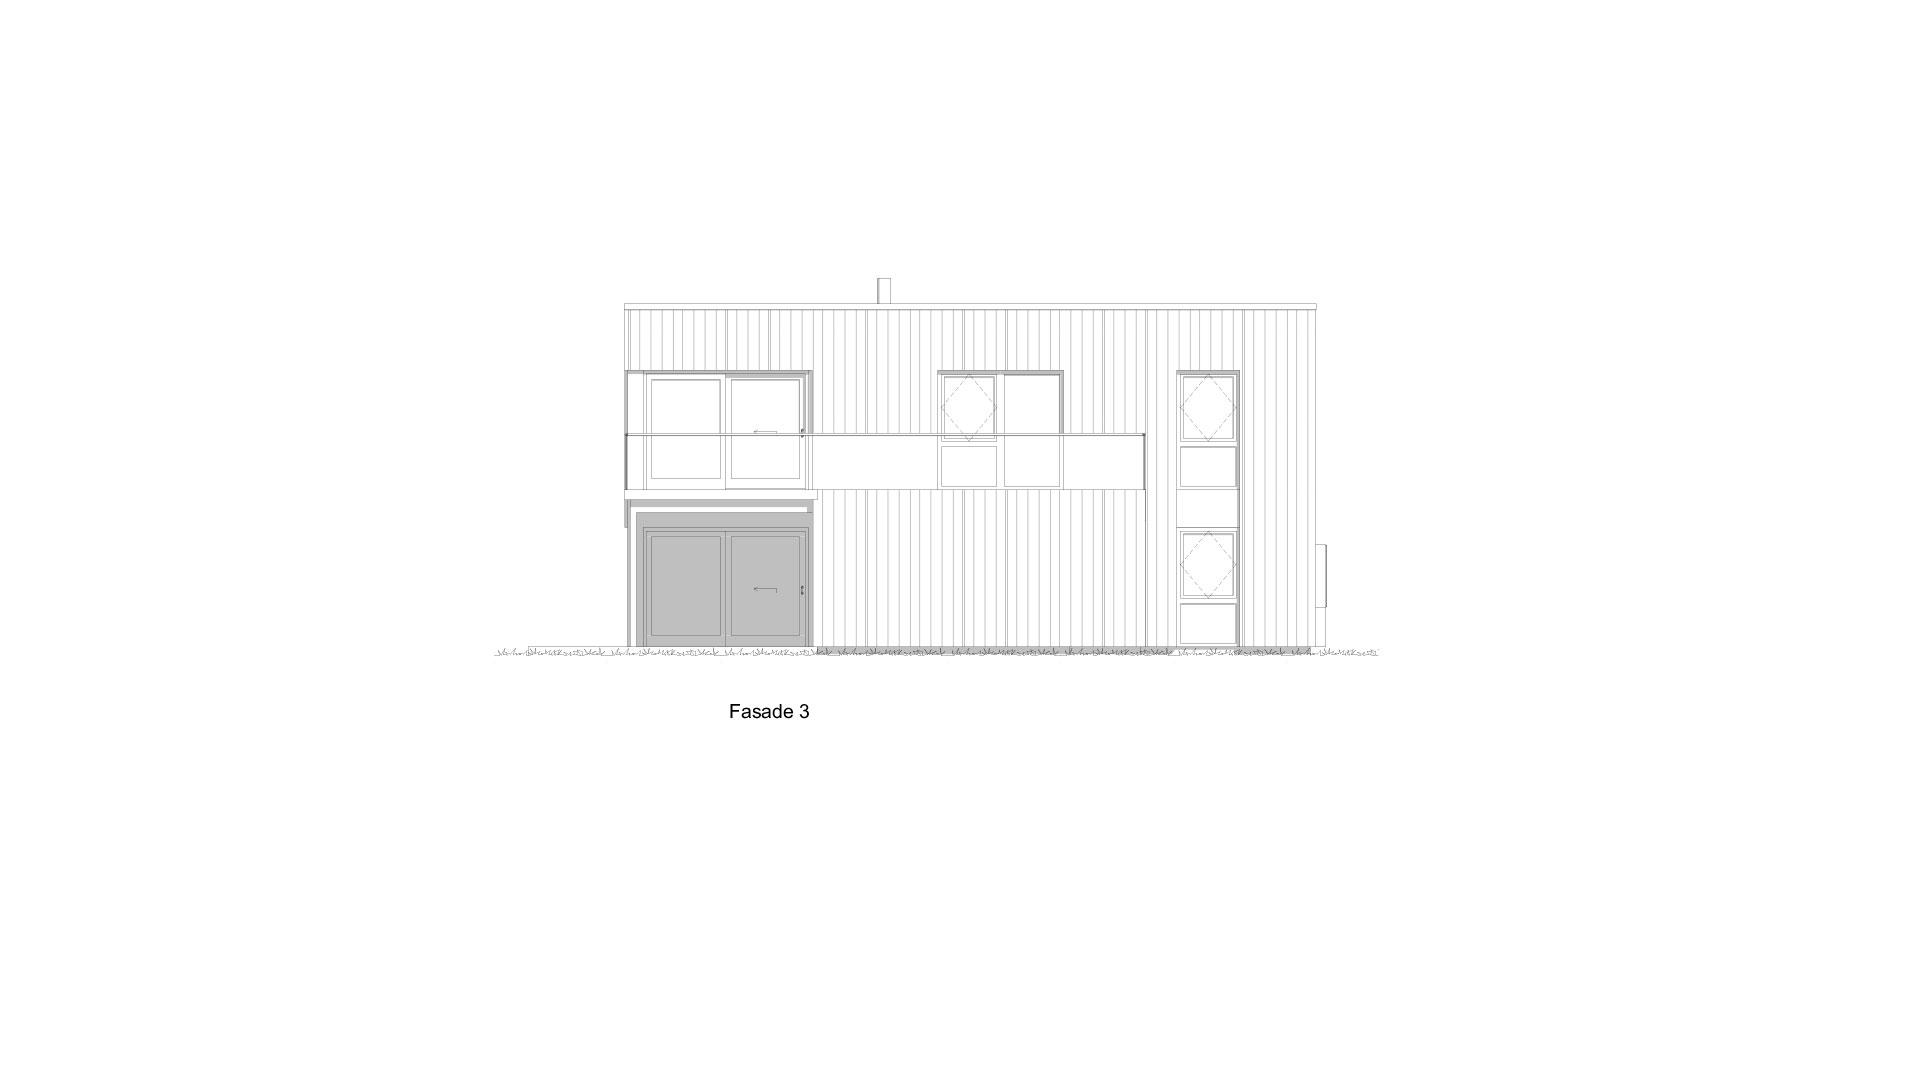 DrapenModerne_Fasade3.jpg